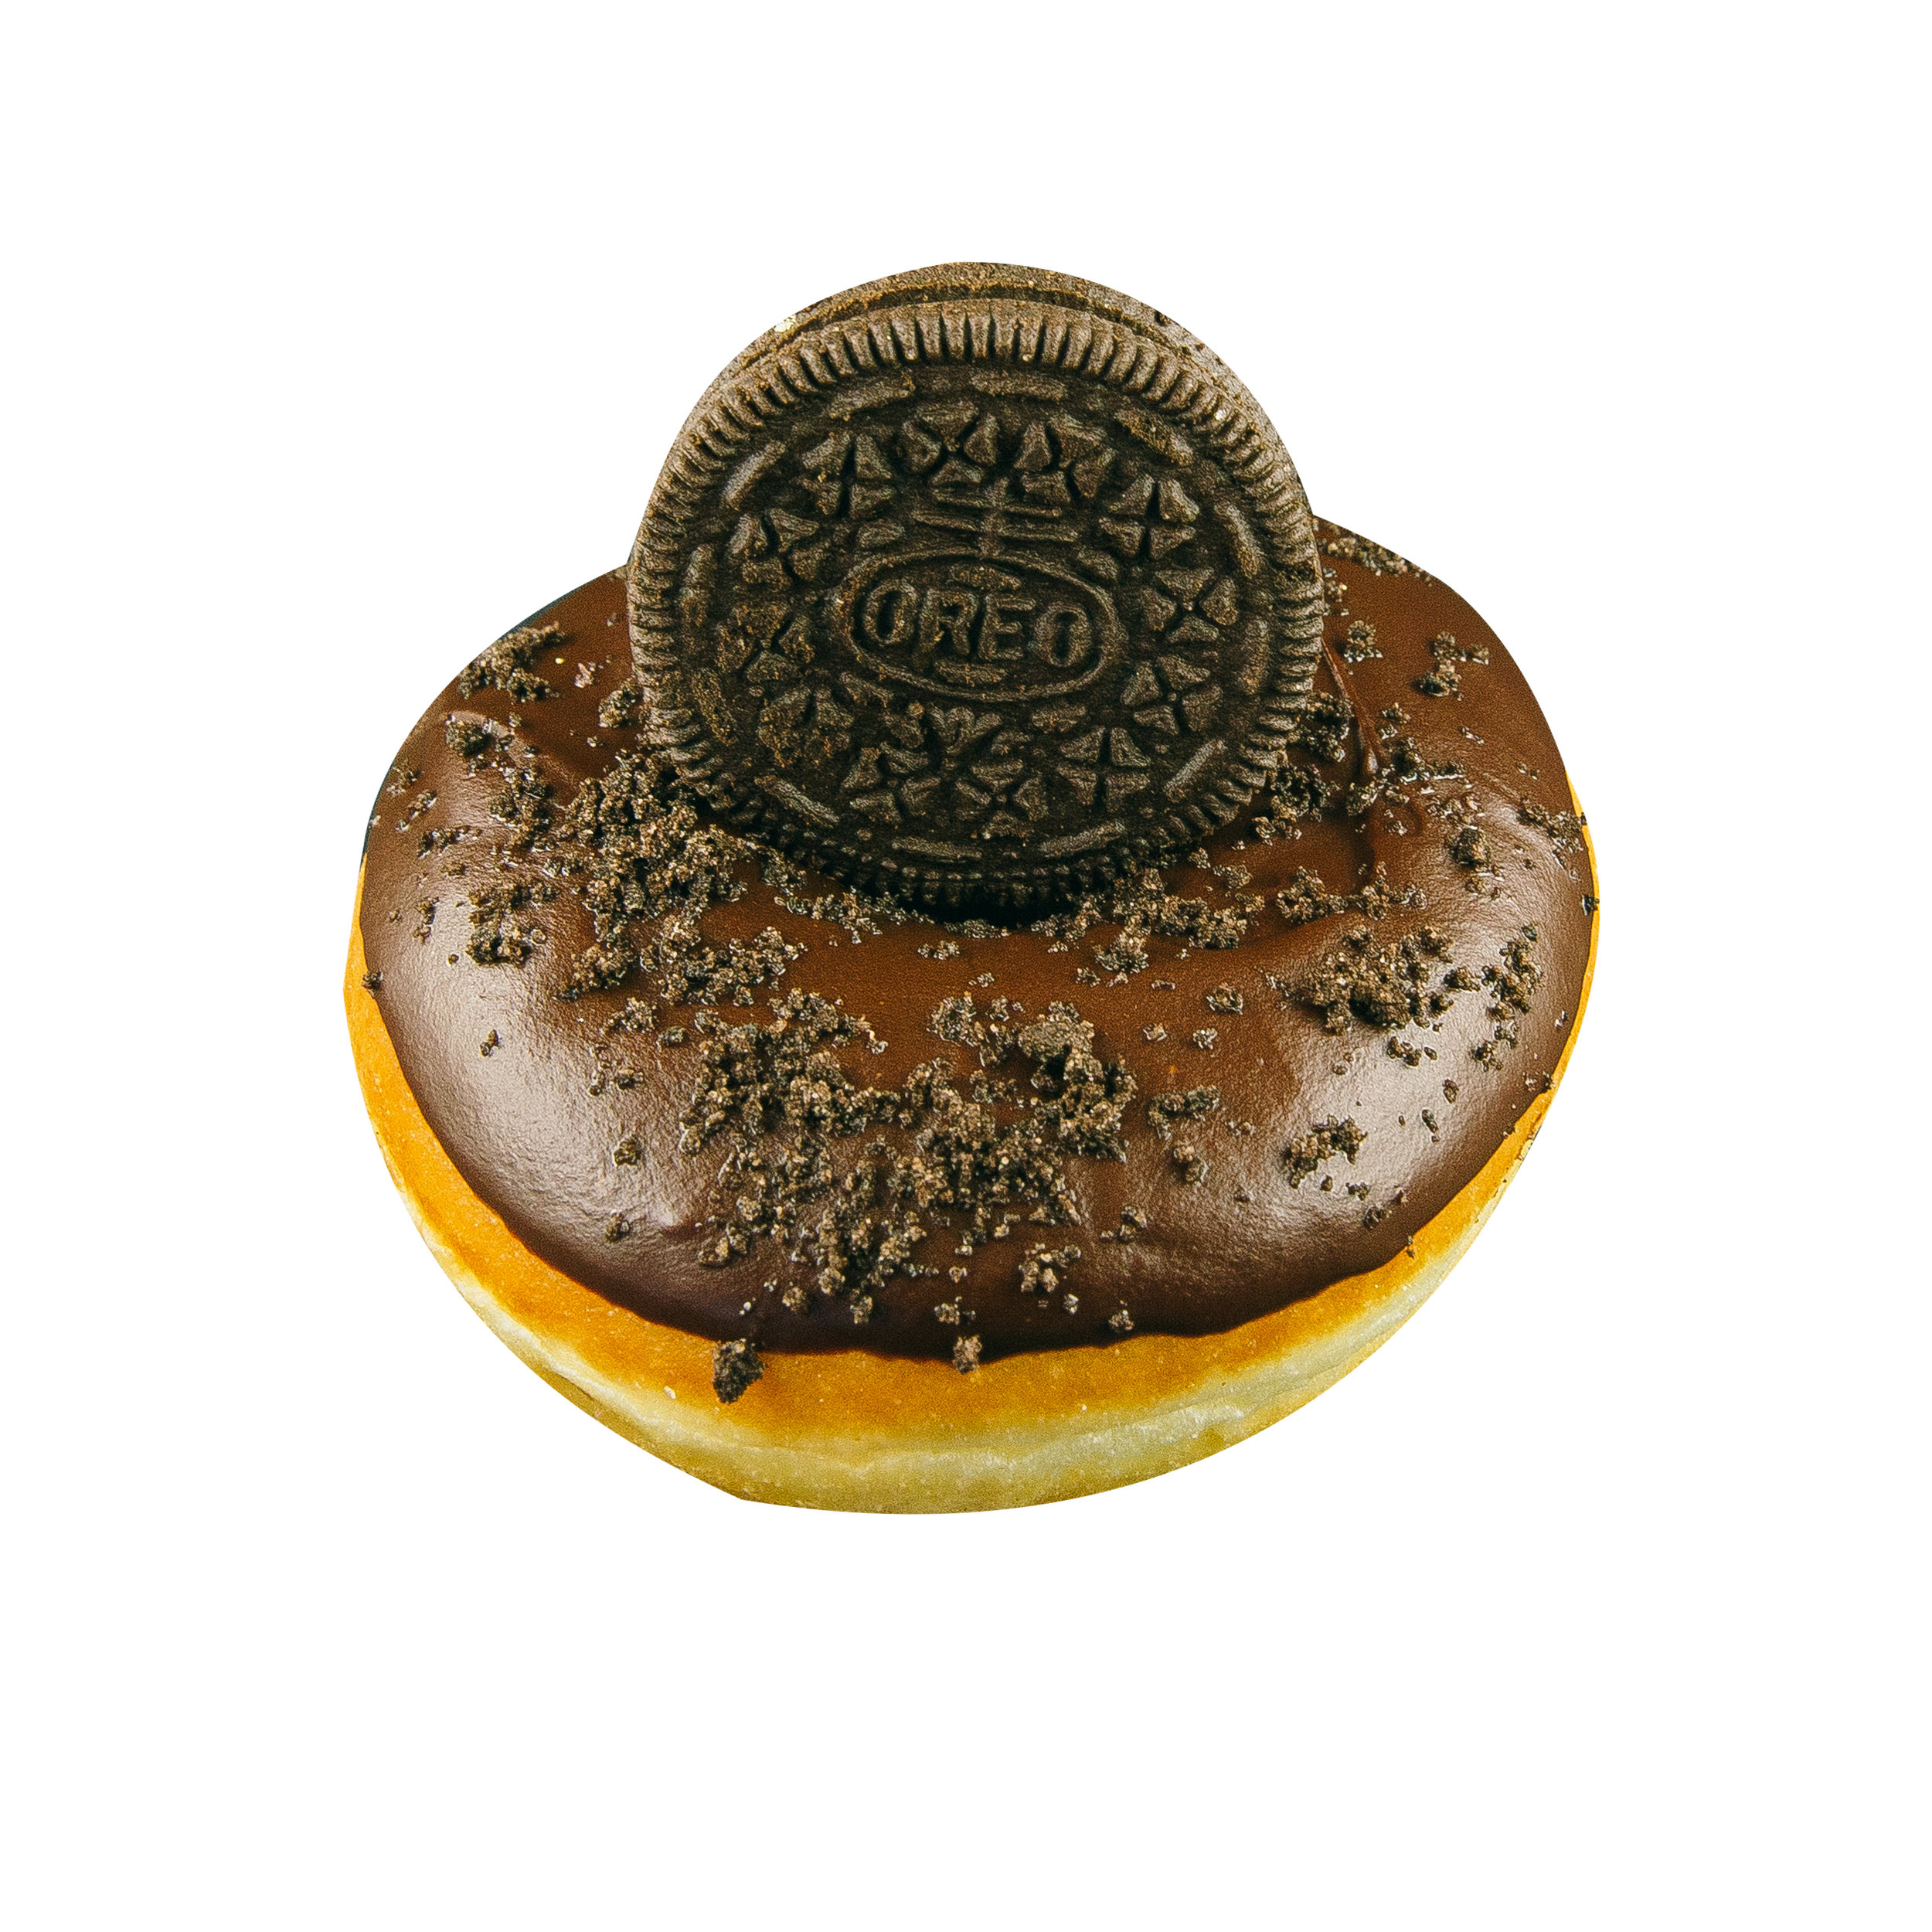 CHOCOLATE OREO - CHOCOLATE GLAZE+ OREO CRUMBS+ OREO